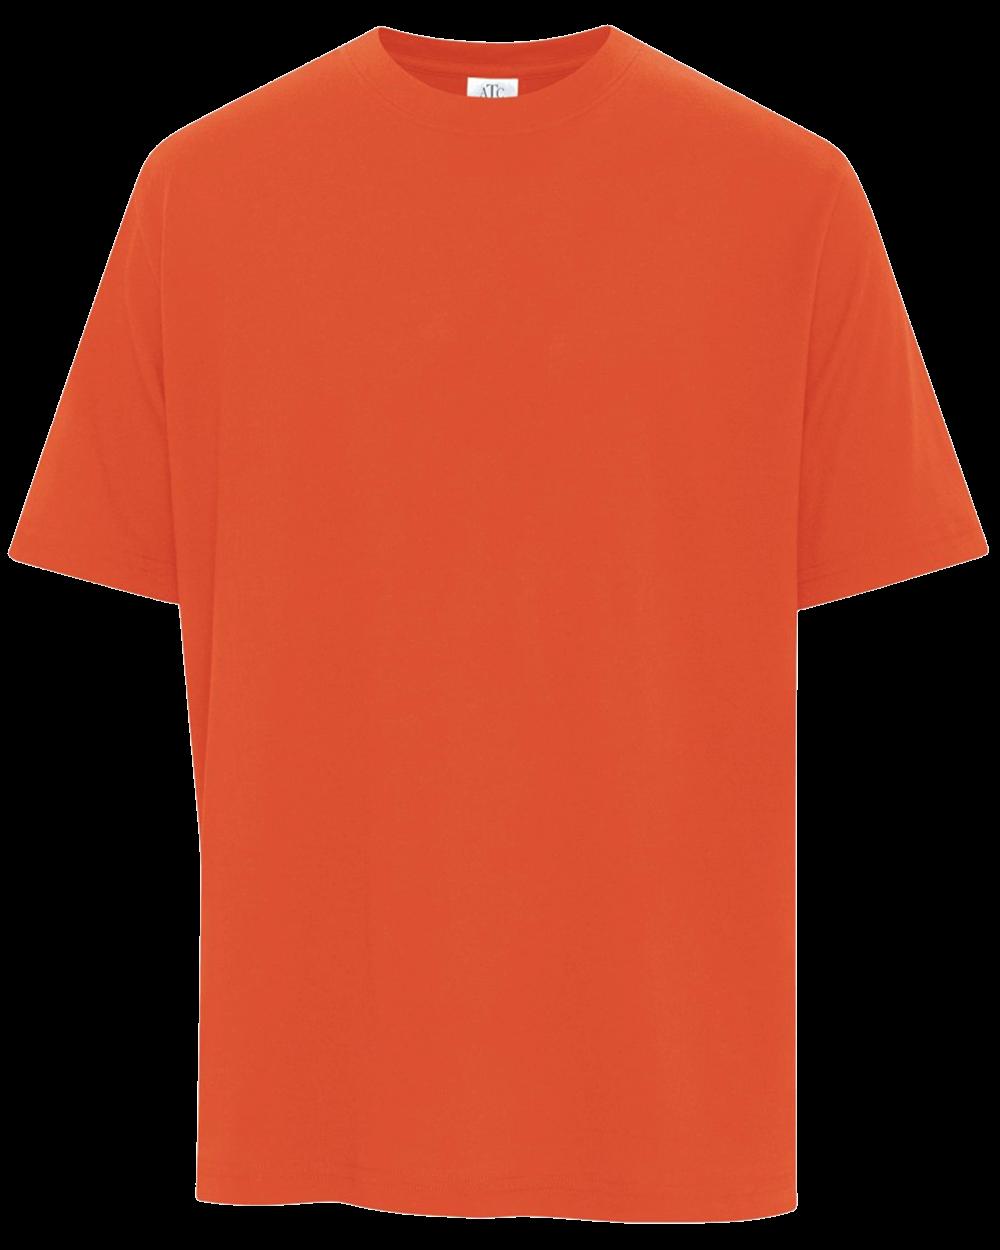 Pro Spun Youth T-Shirt